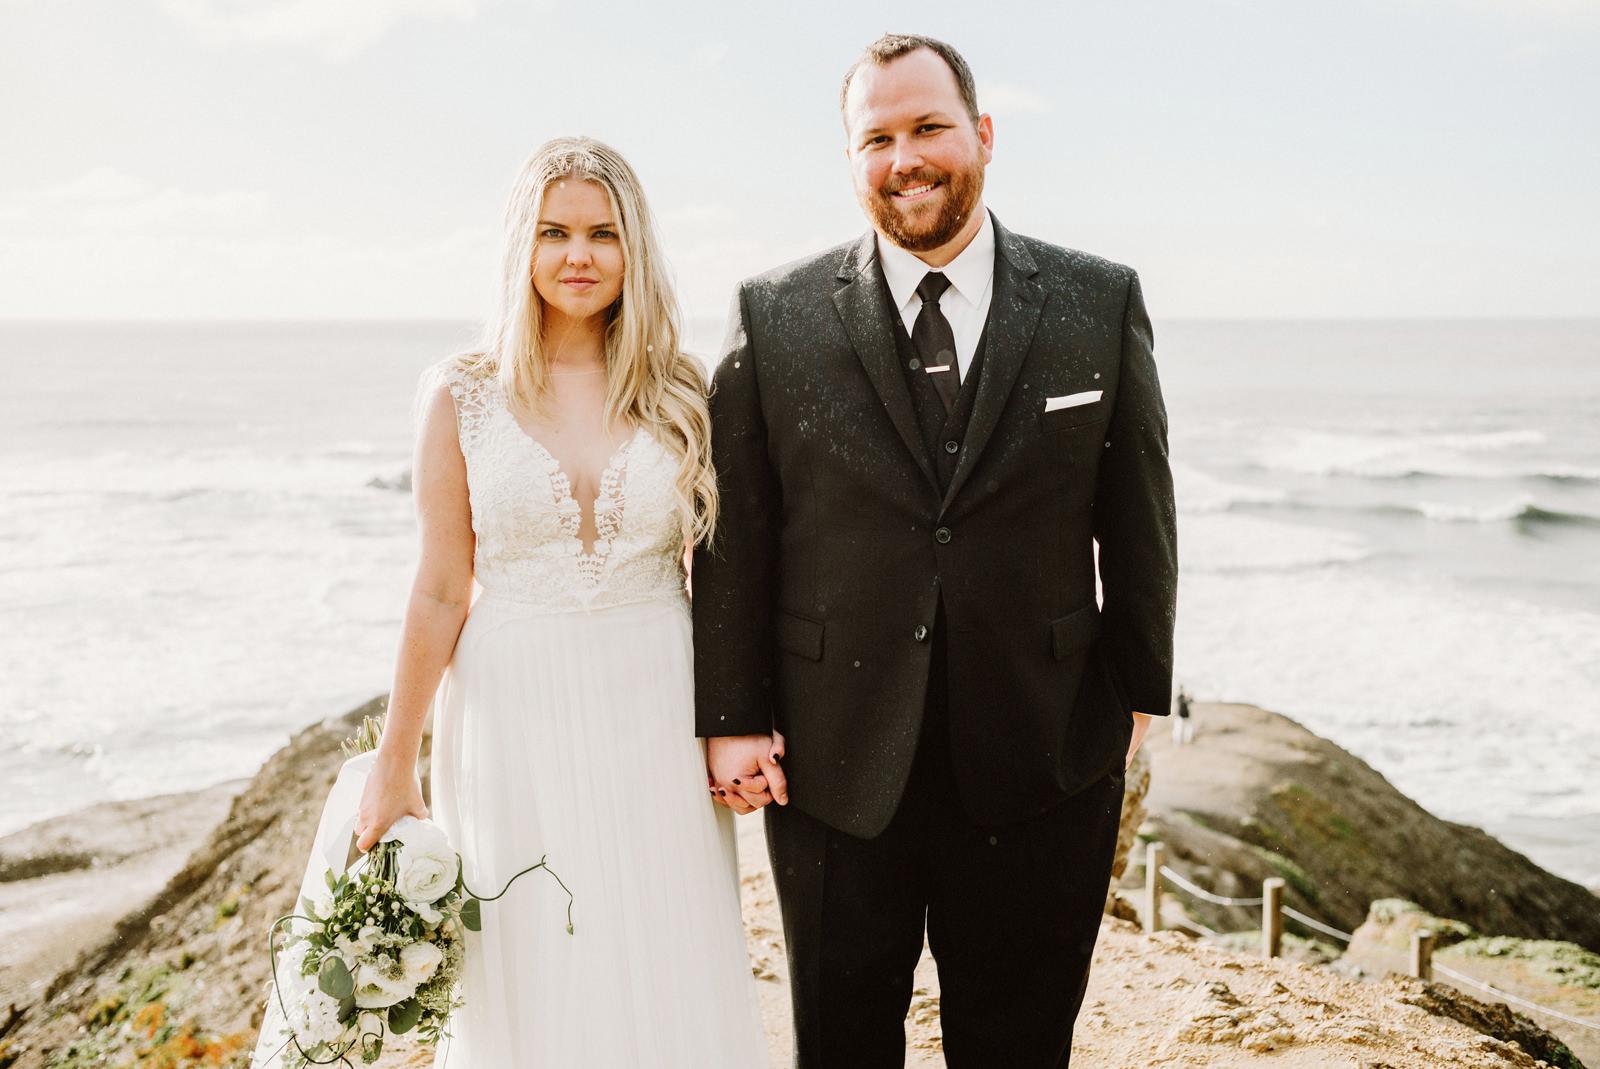 san-francisco-city-hall-elopement-44 SAN FRANCISCO CITY HALL INTIMATE WEDDING